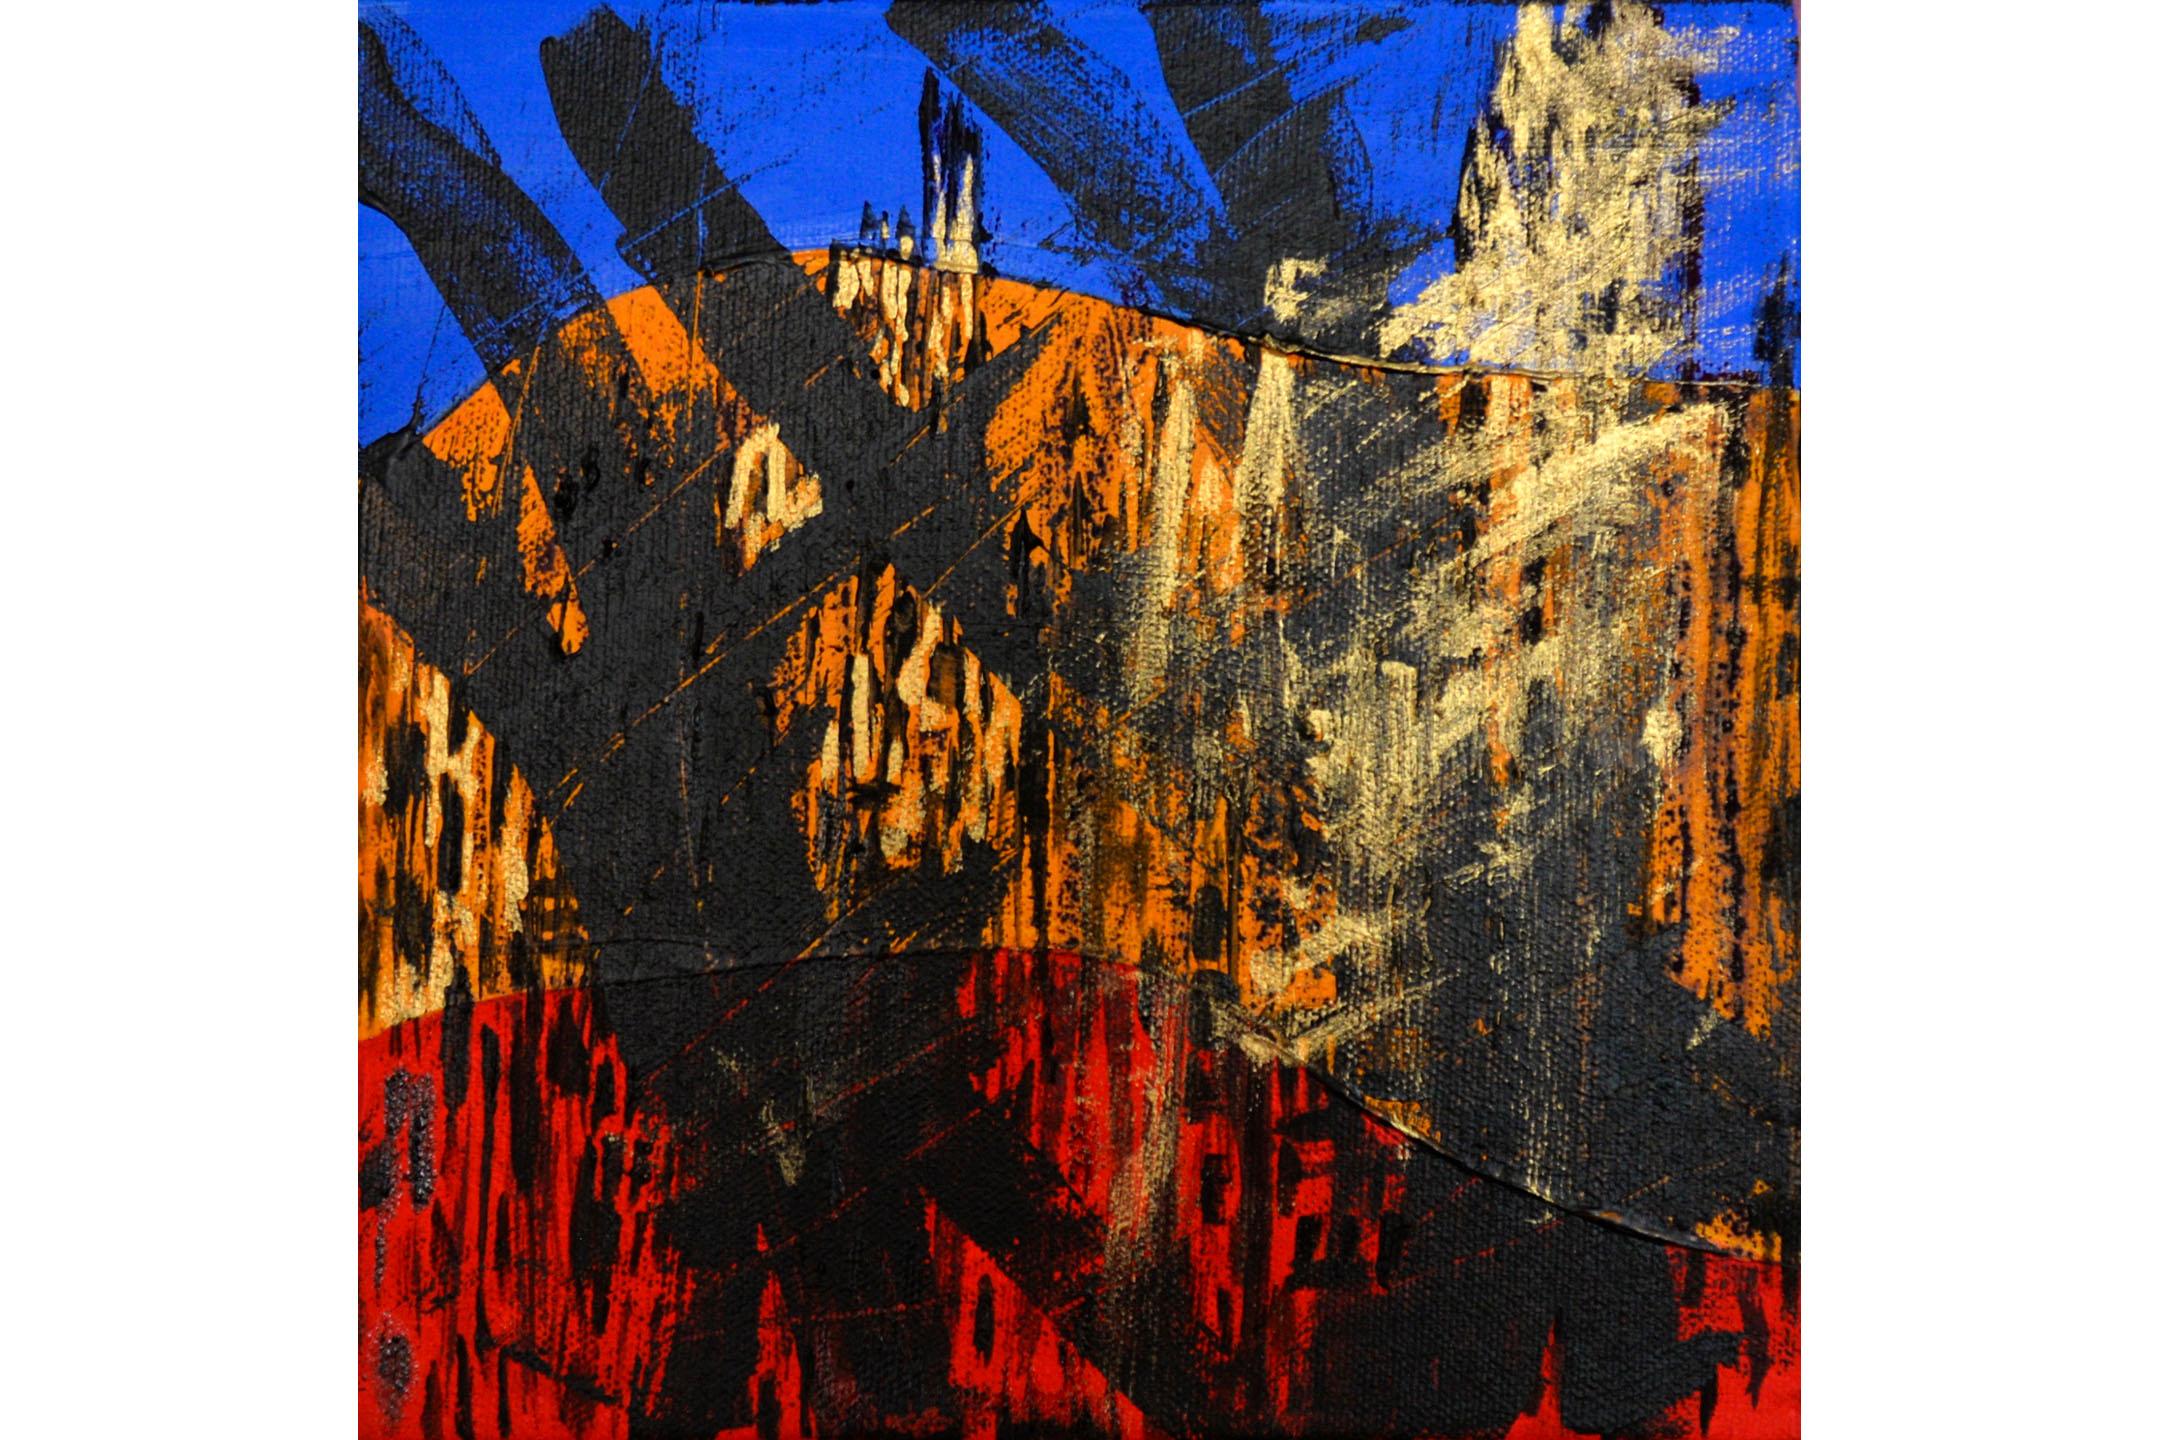 "Azita Ghafouri, Basics of Jane Jacobs 3, Mixed media on canvas, 8"" x 8"", 2016"